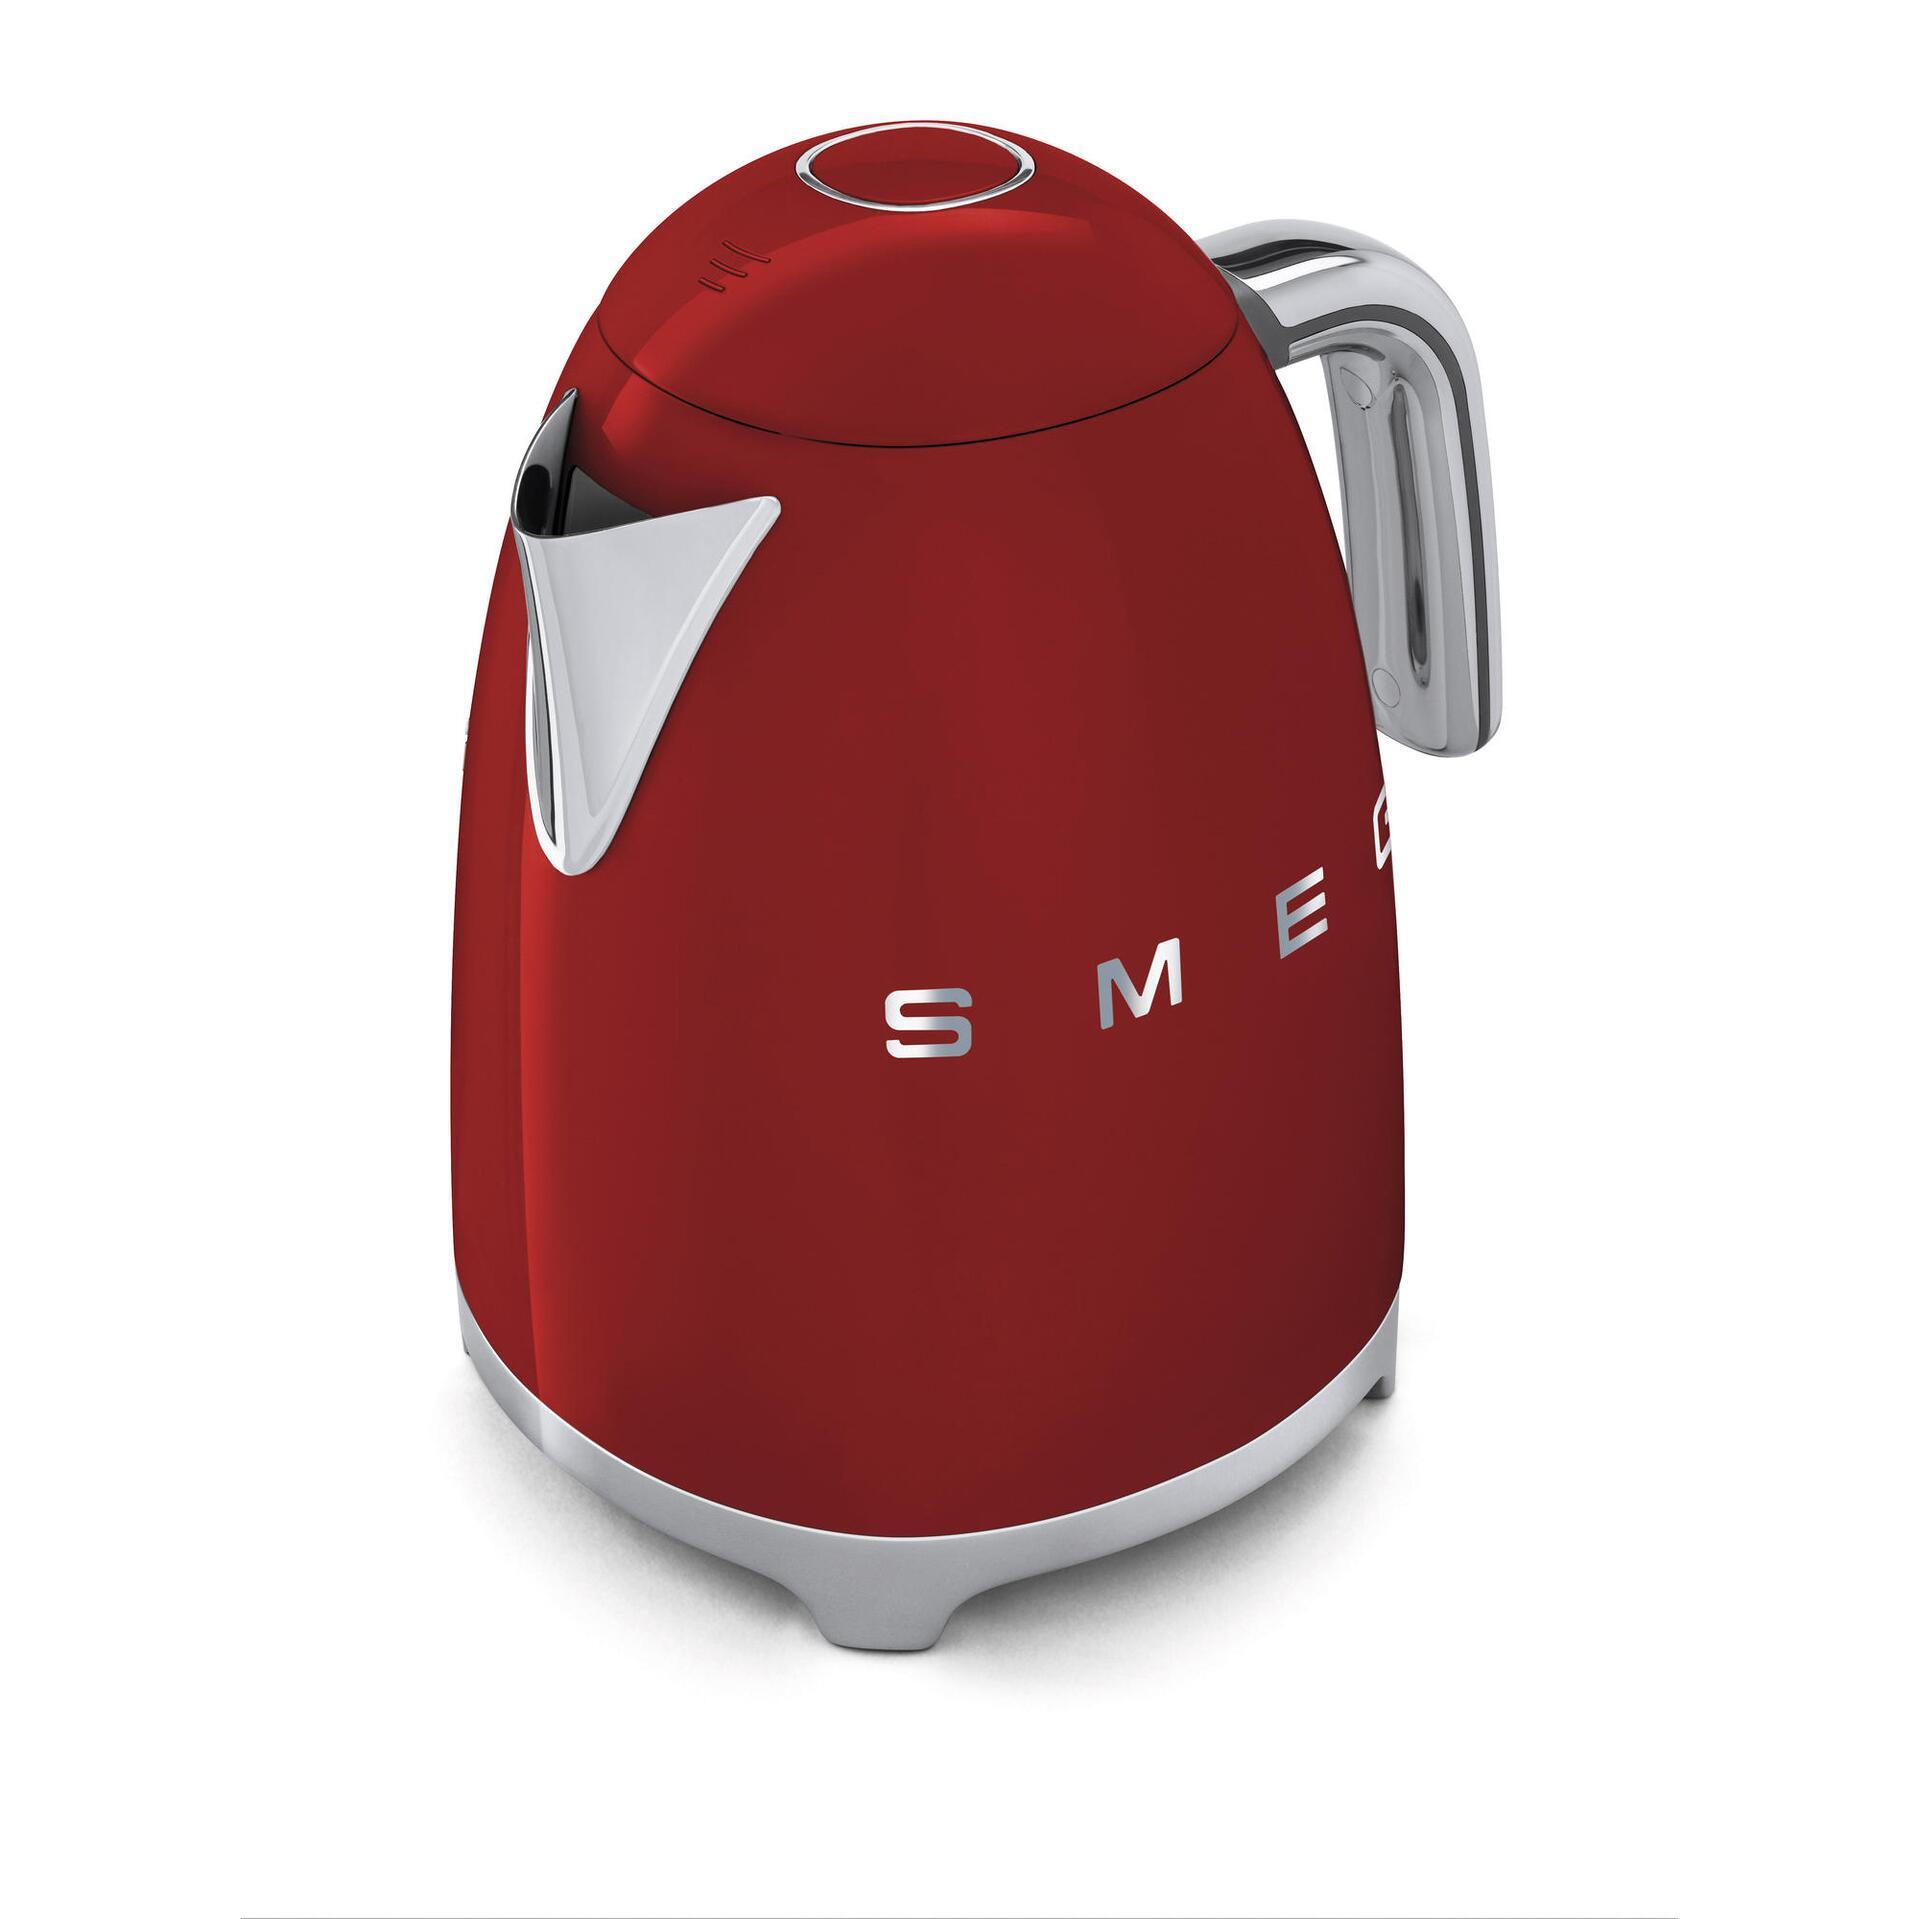 Smeg Retro Wasserkocher 1,7 Liter Rot